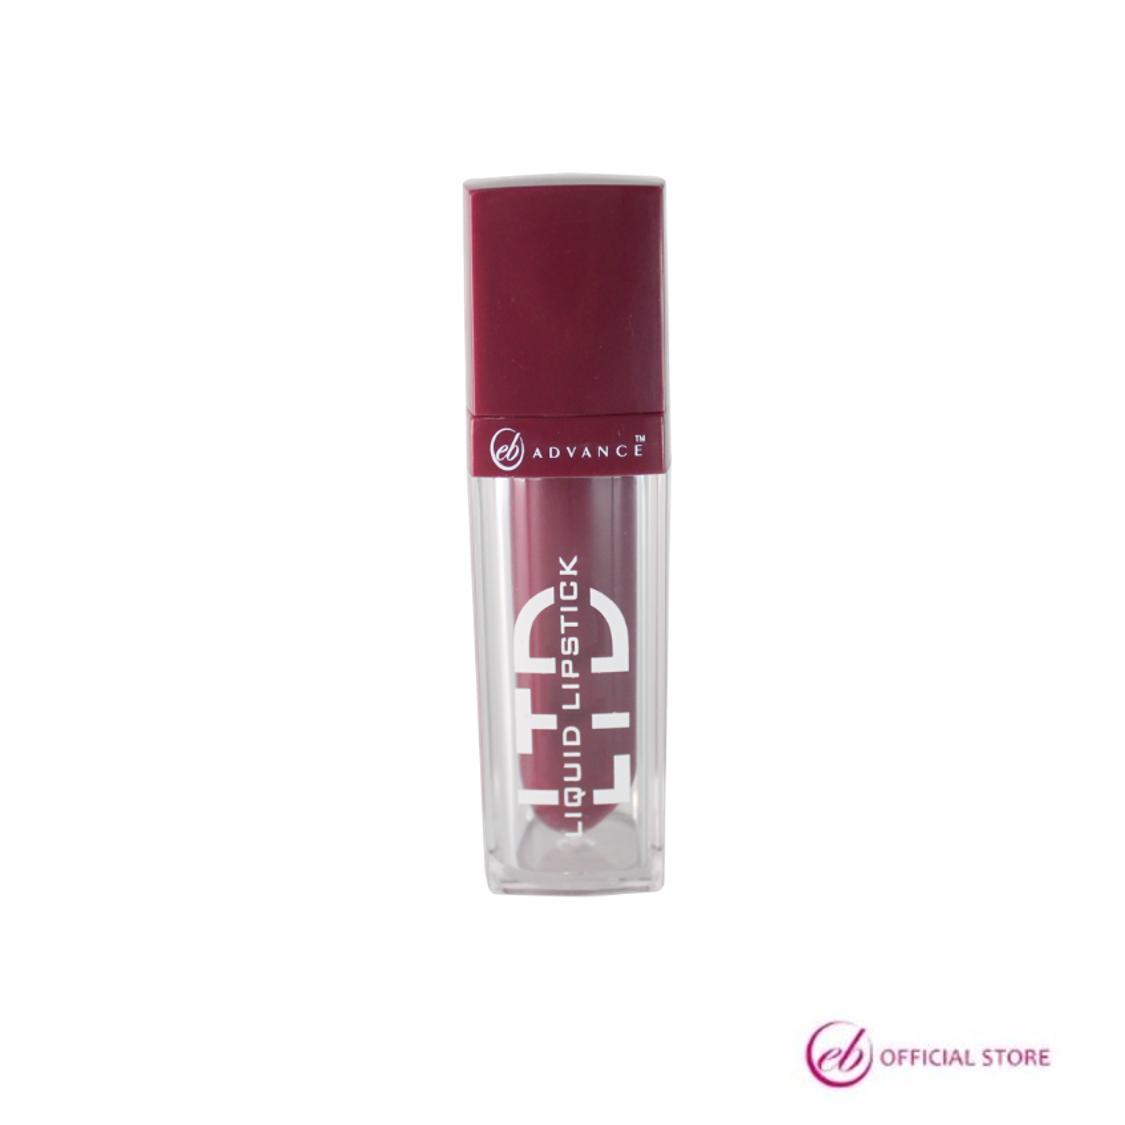 EB Advance LTD Liquid Lipstick Philippines